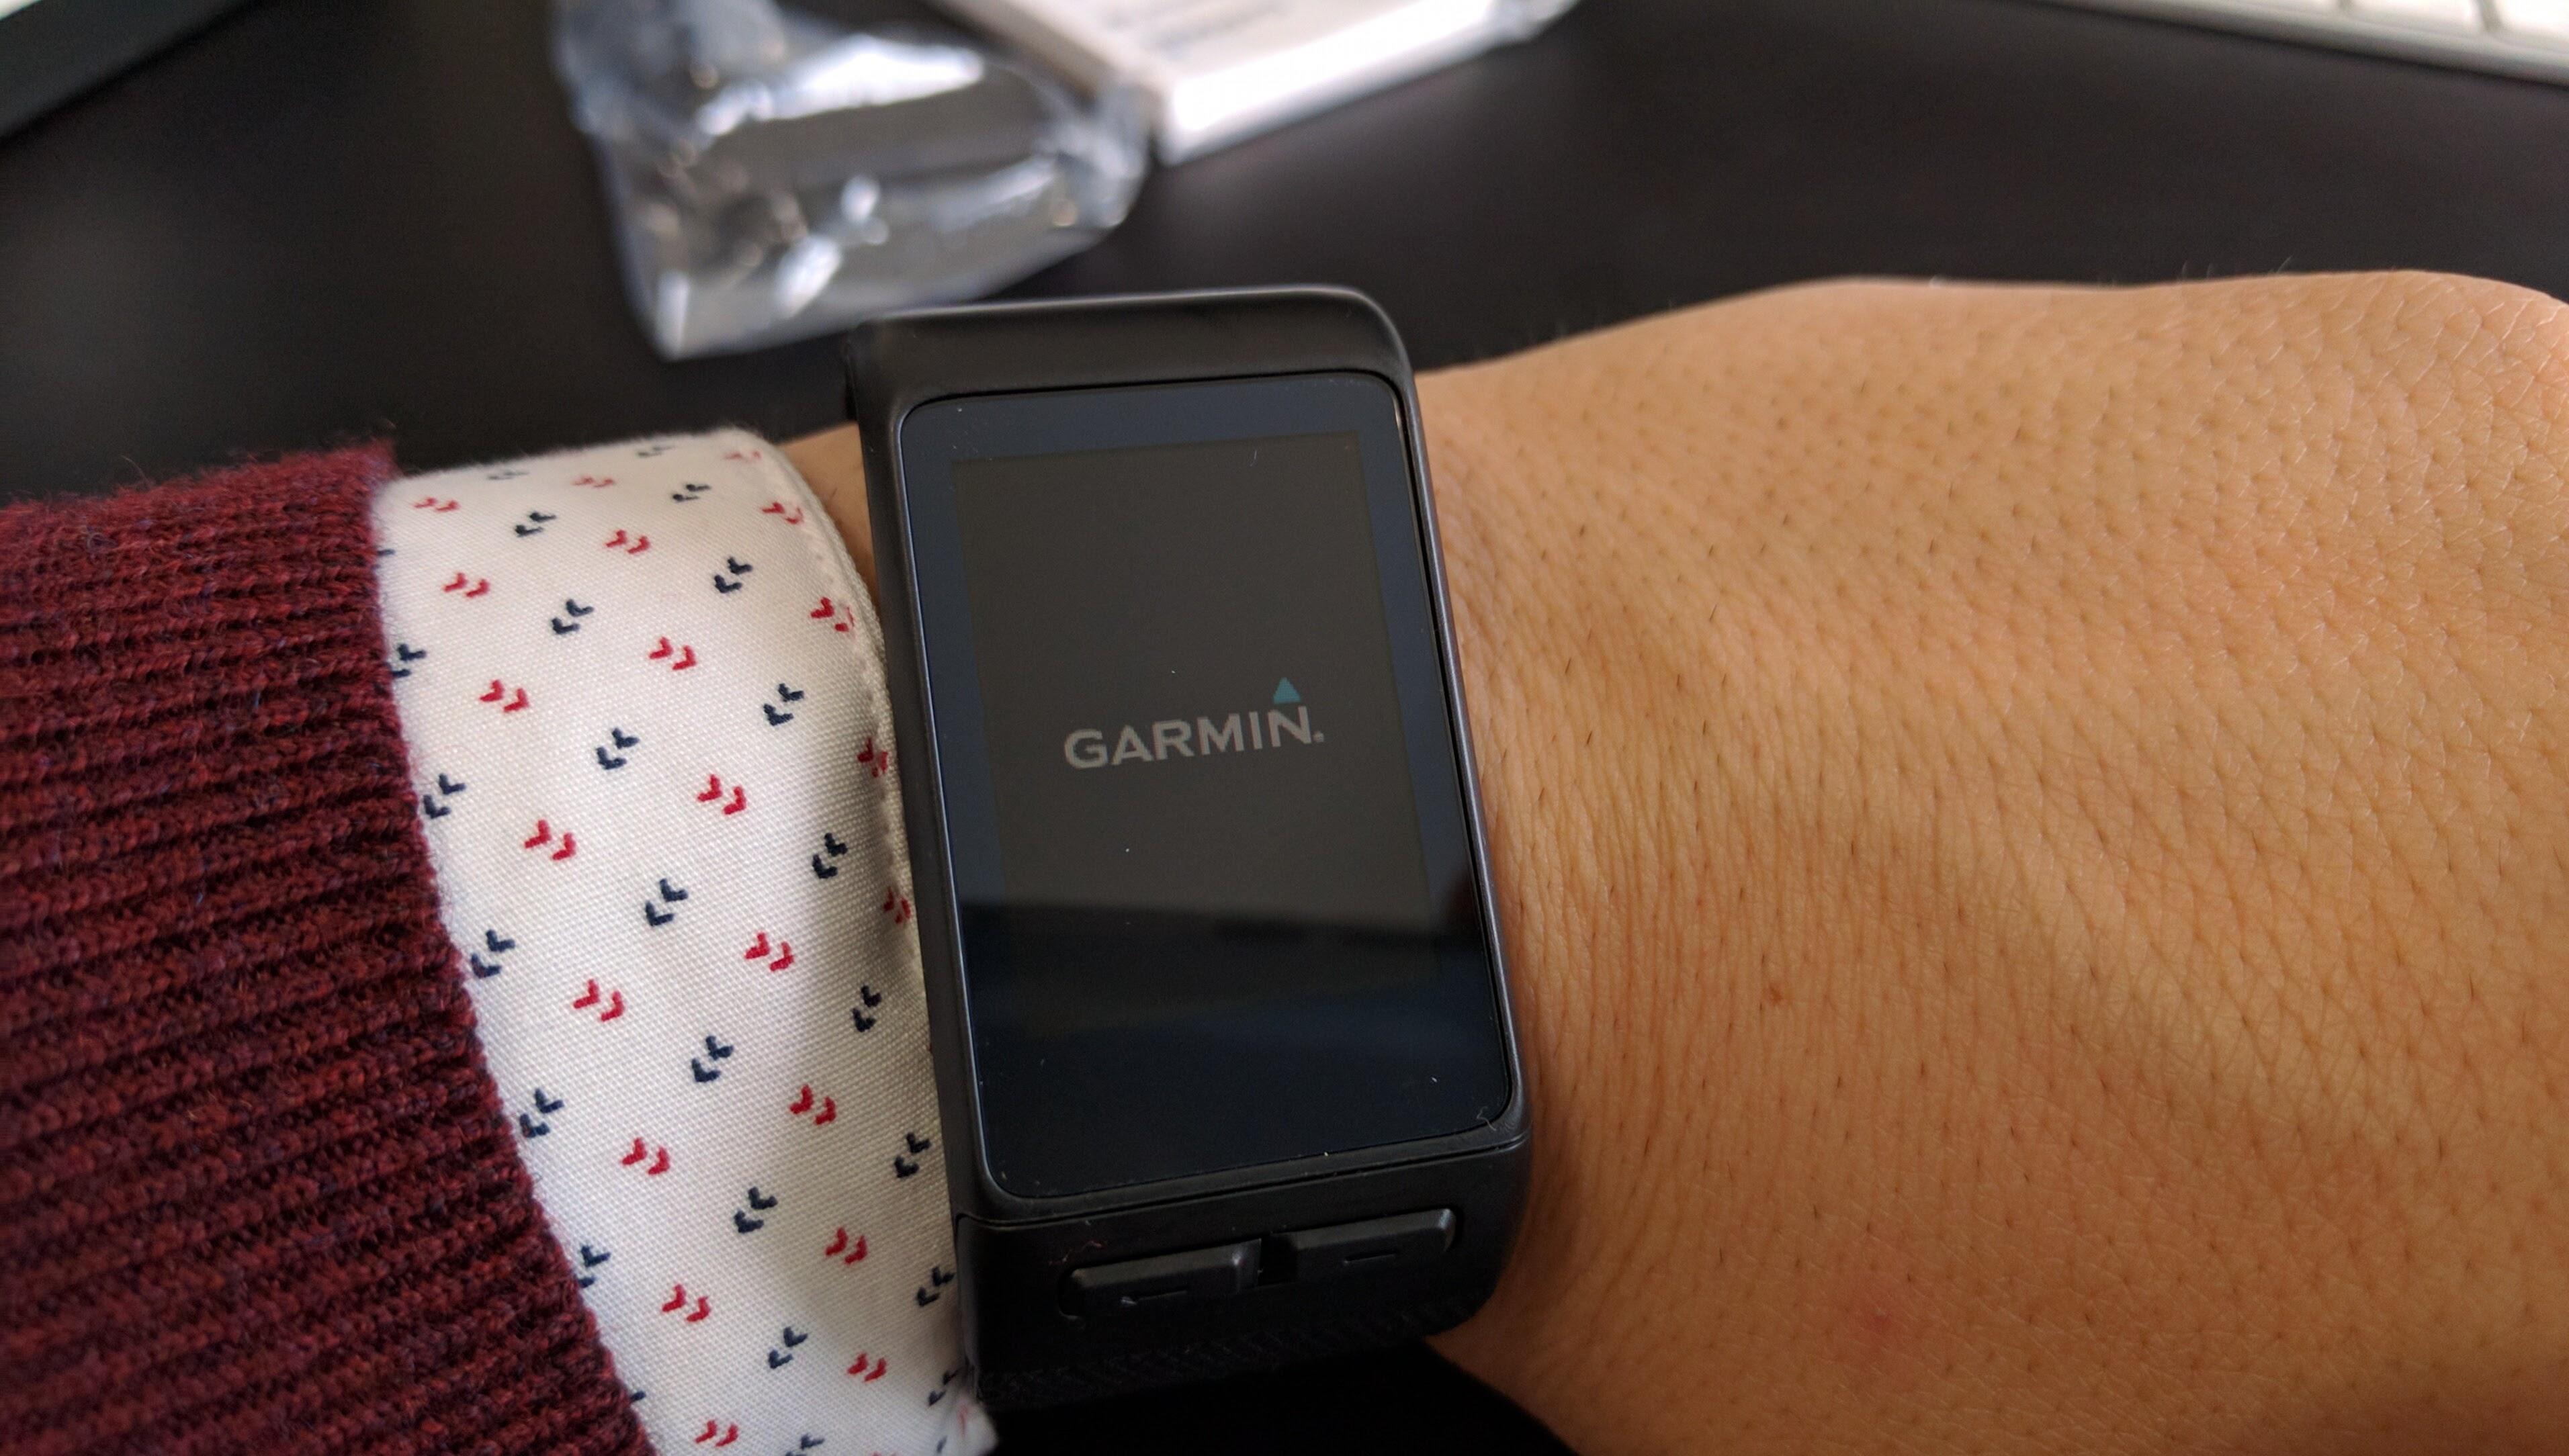 Set Garmin Vivoactive HR notifications for Telegram — userlinux net